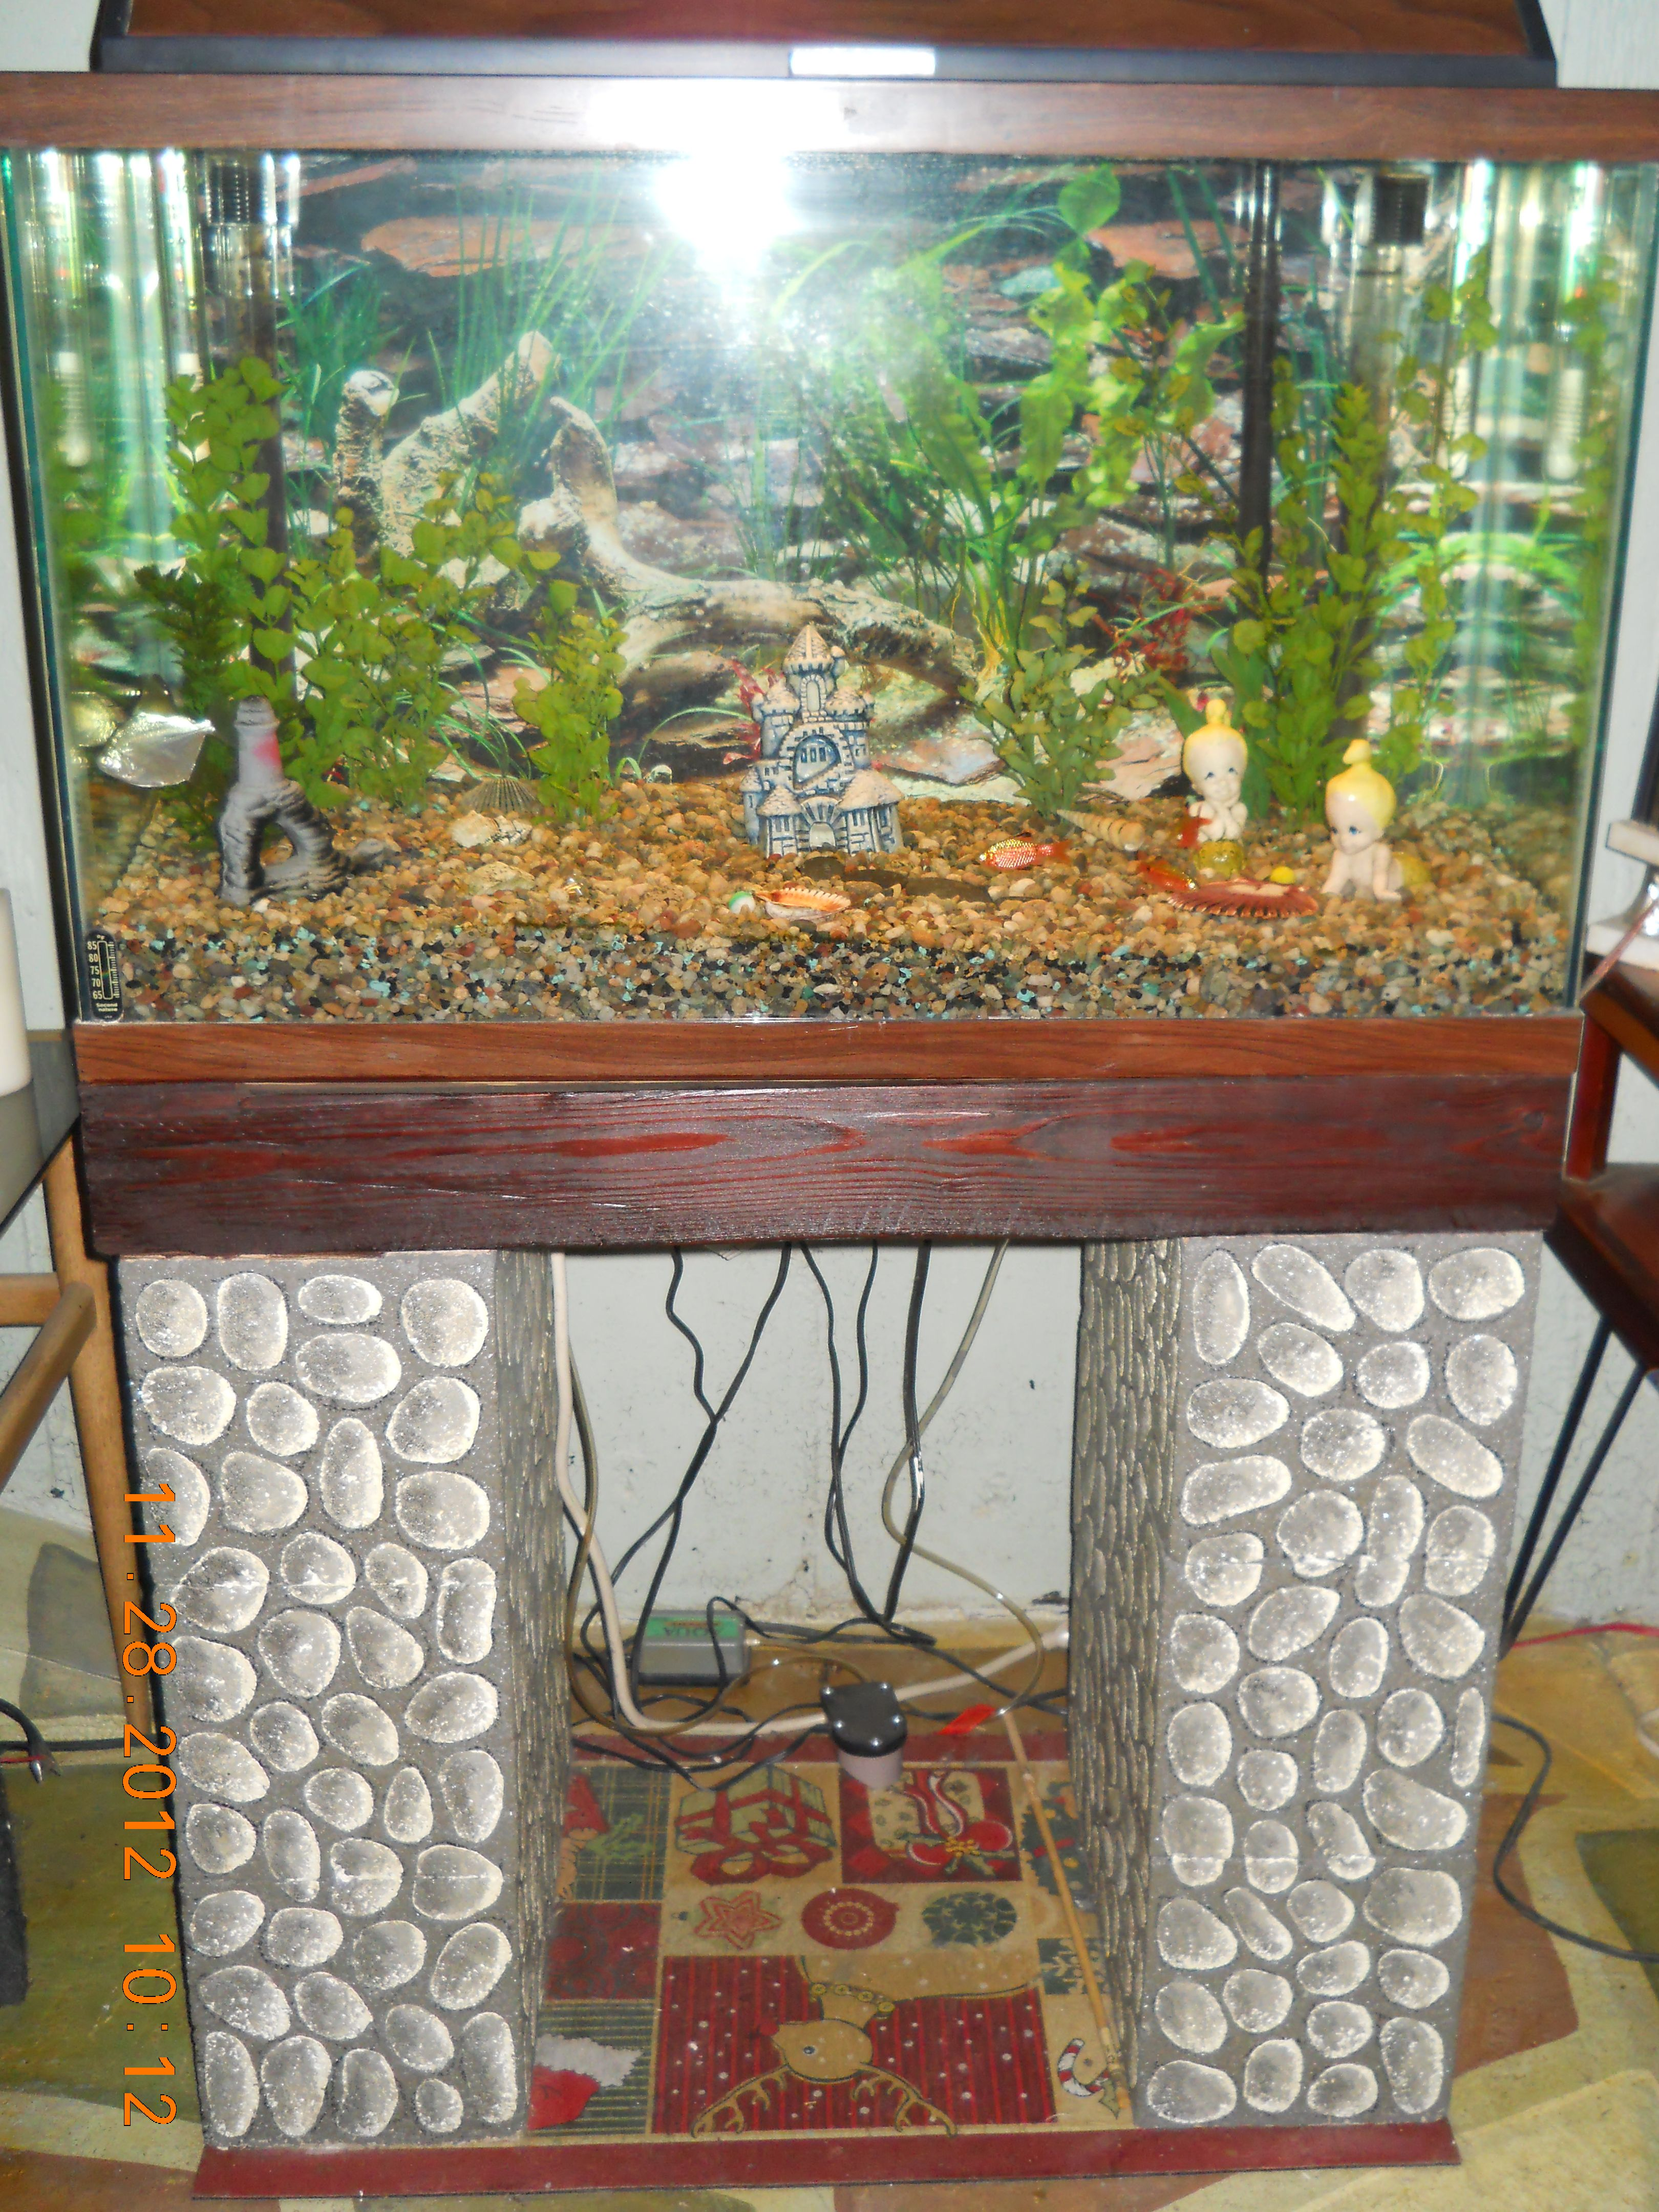 Freshwater aquarium fish jacksonville fl - Cheaper Than Buying A Aquarium Stand